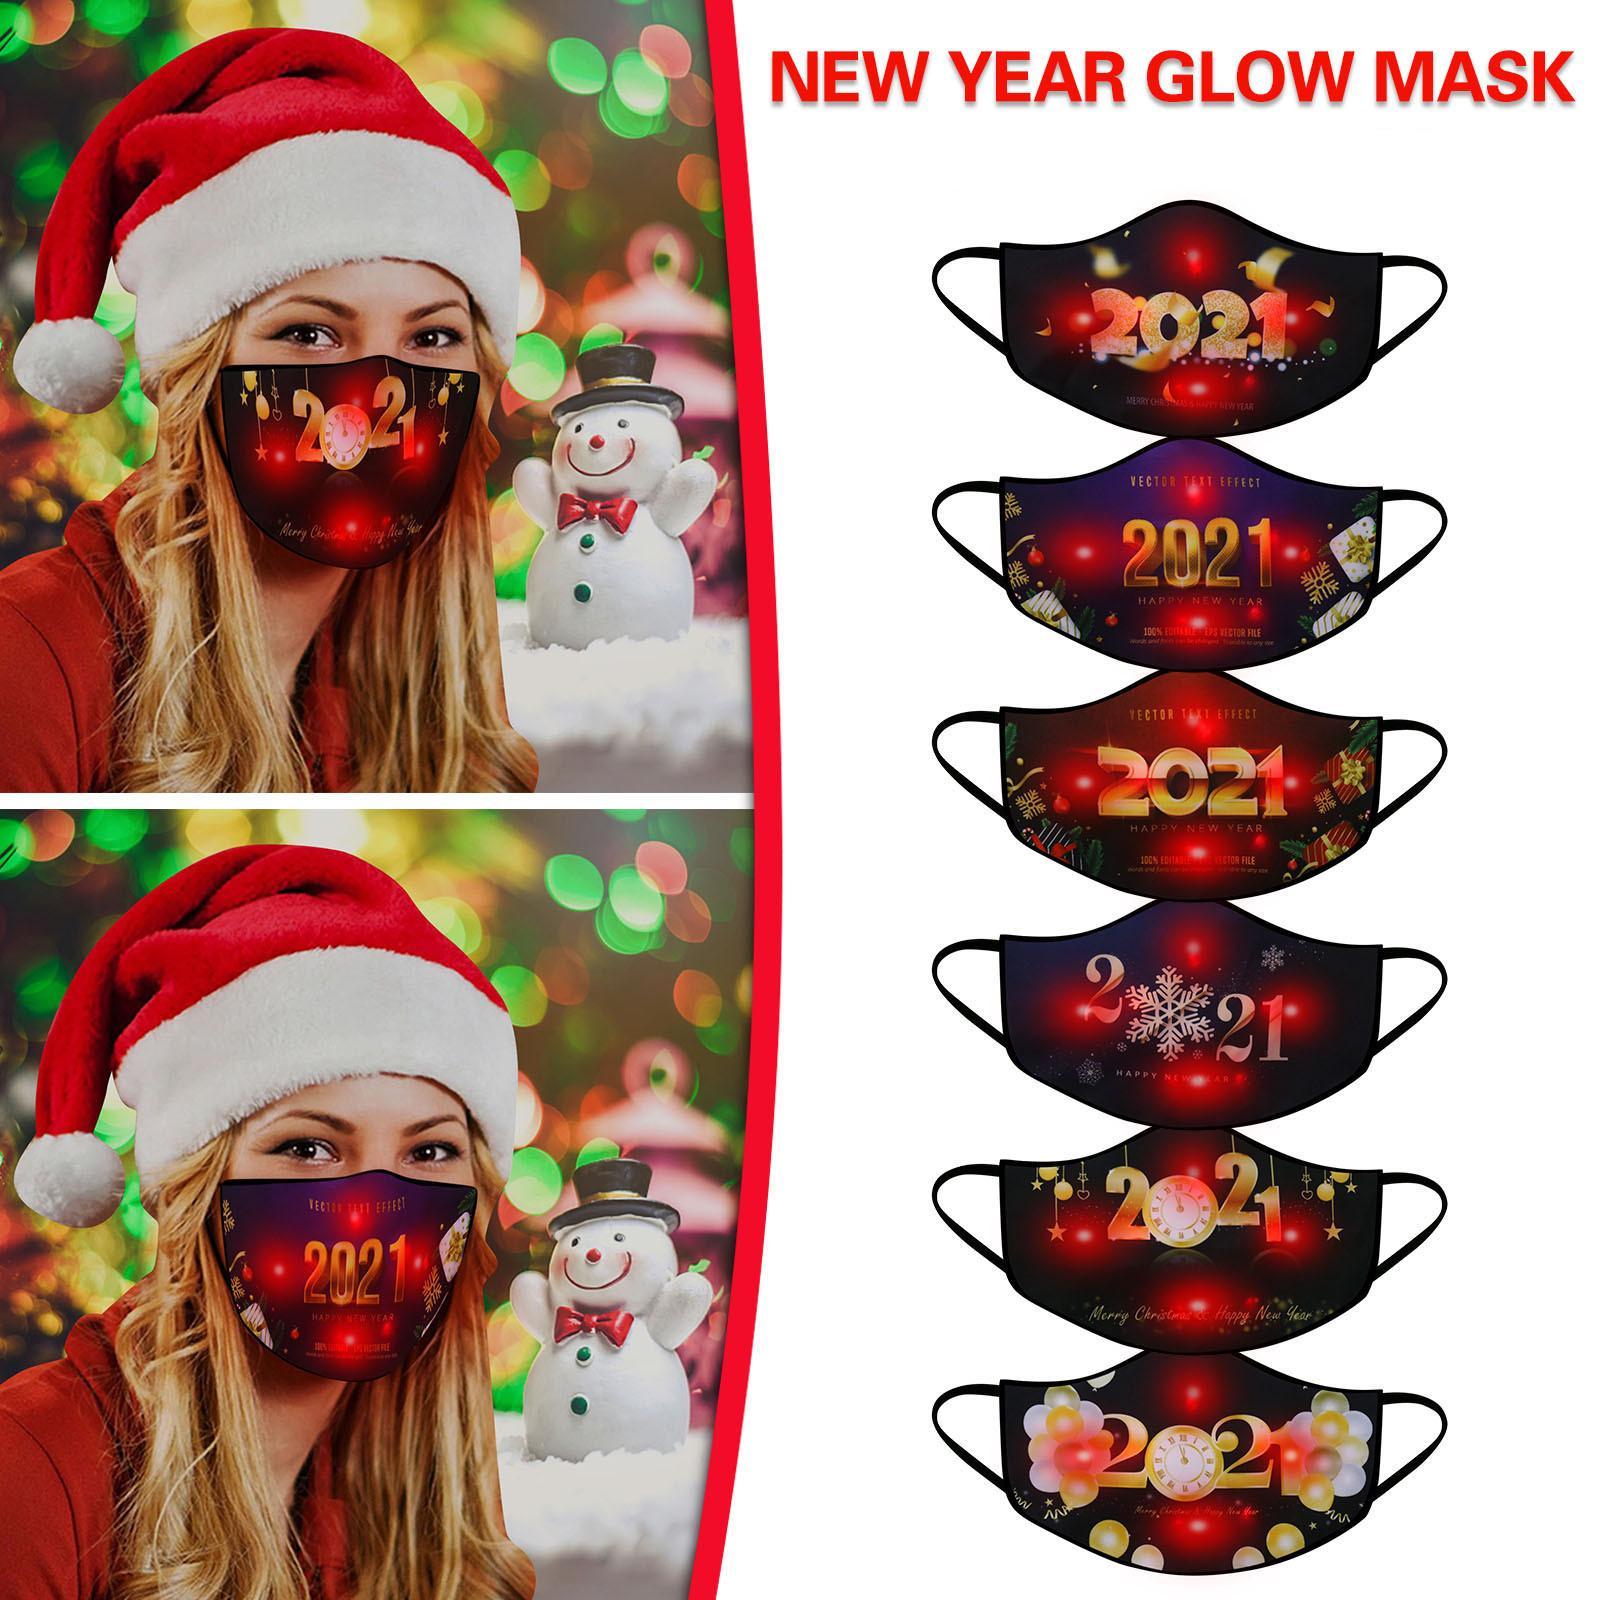 Máscara luminosa 7 cores mudando a máscara facial do diodo emissor de luz do diodo emissor de luz para 2021 máscaras adultas do máscaras do ano novo